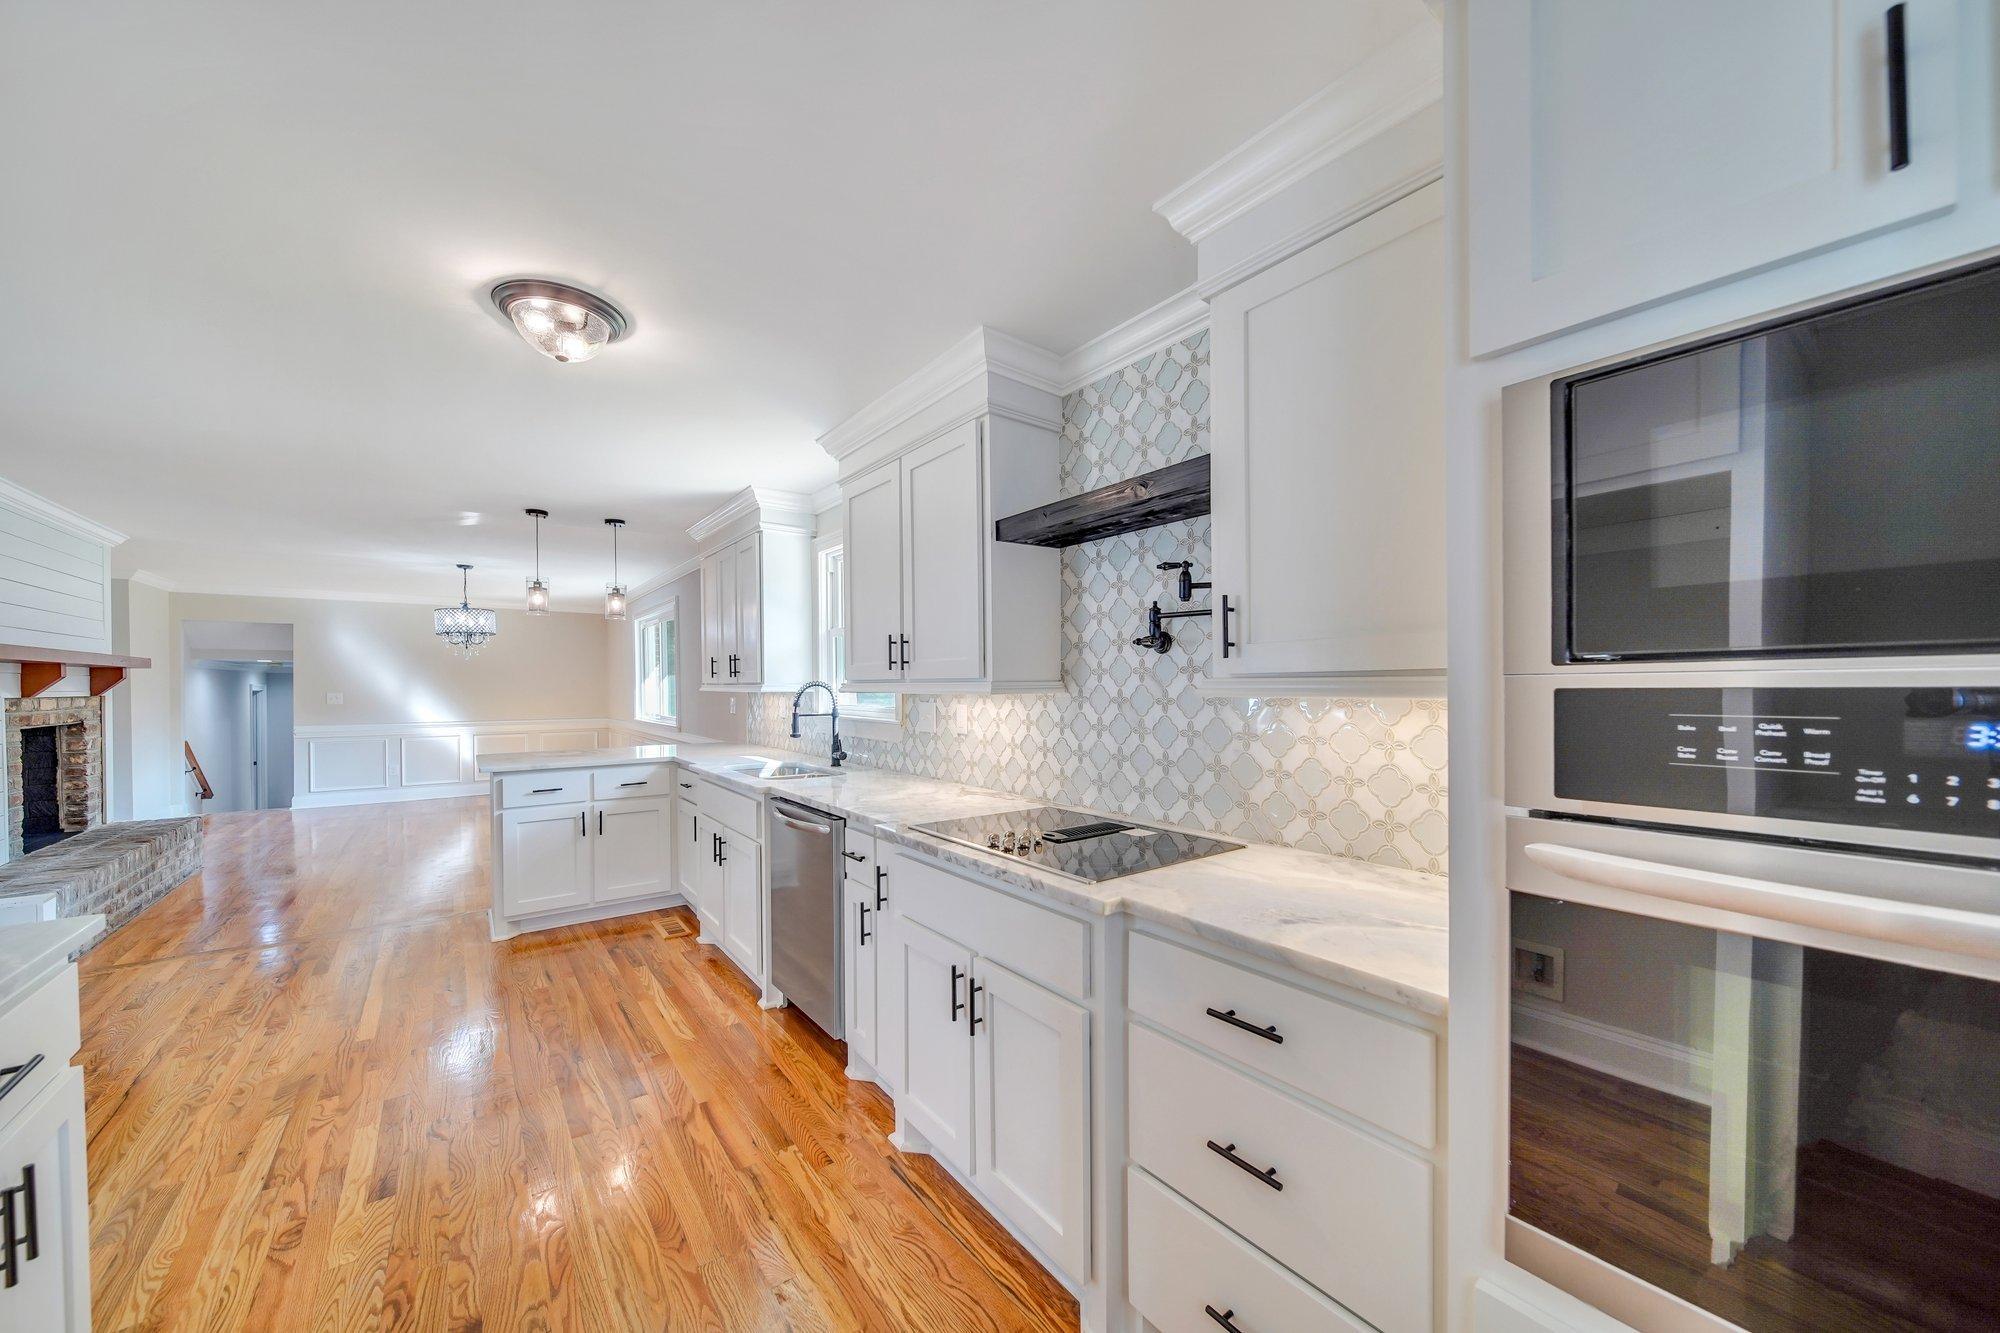 Country Club II Homes For Sale - 1477 Burningtree, Charleston, SC - 9